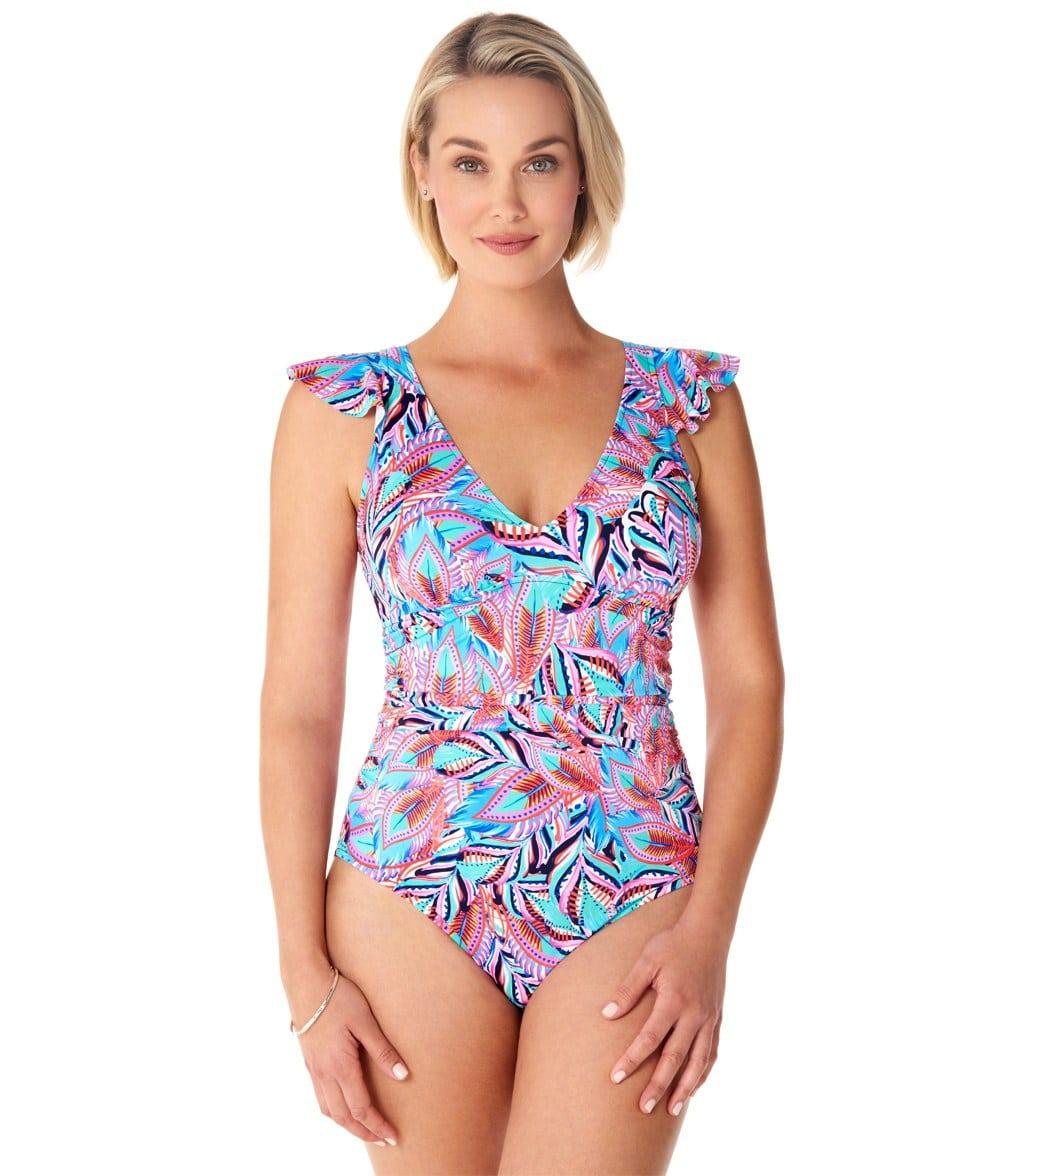 364ba38a0f Penbrooke Tropical Punch V-Neck Flounce Shoulder Portrait Back One Piece  Swimsuit at SwimOutlet.com - Free Shipping